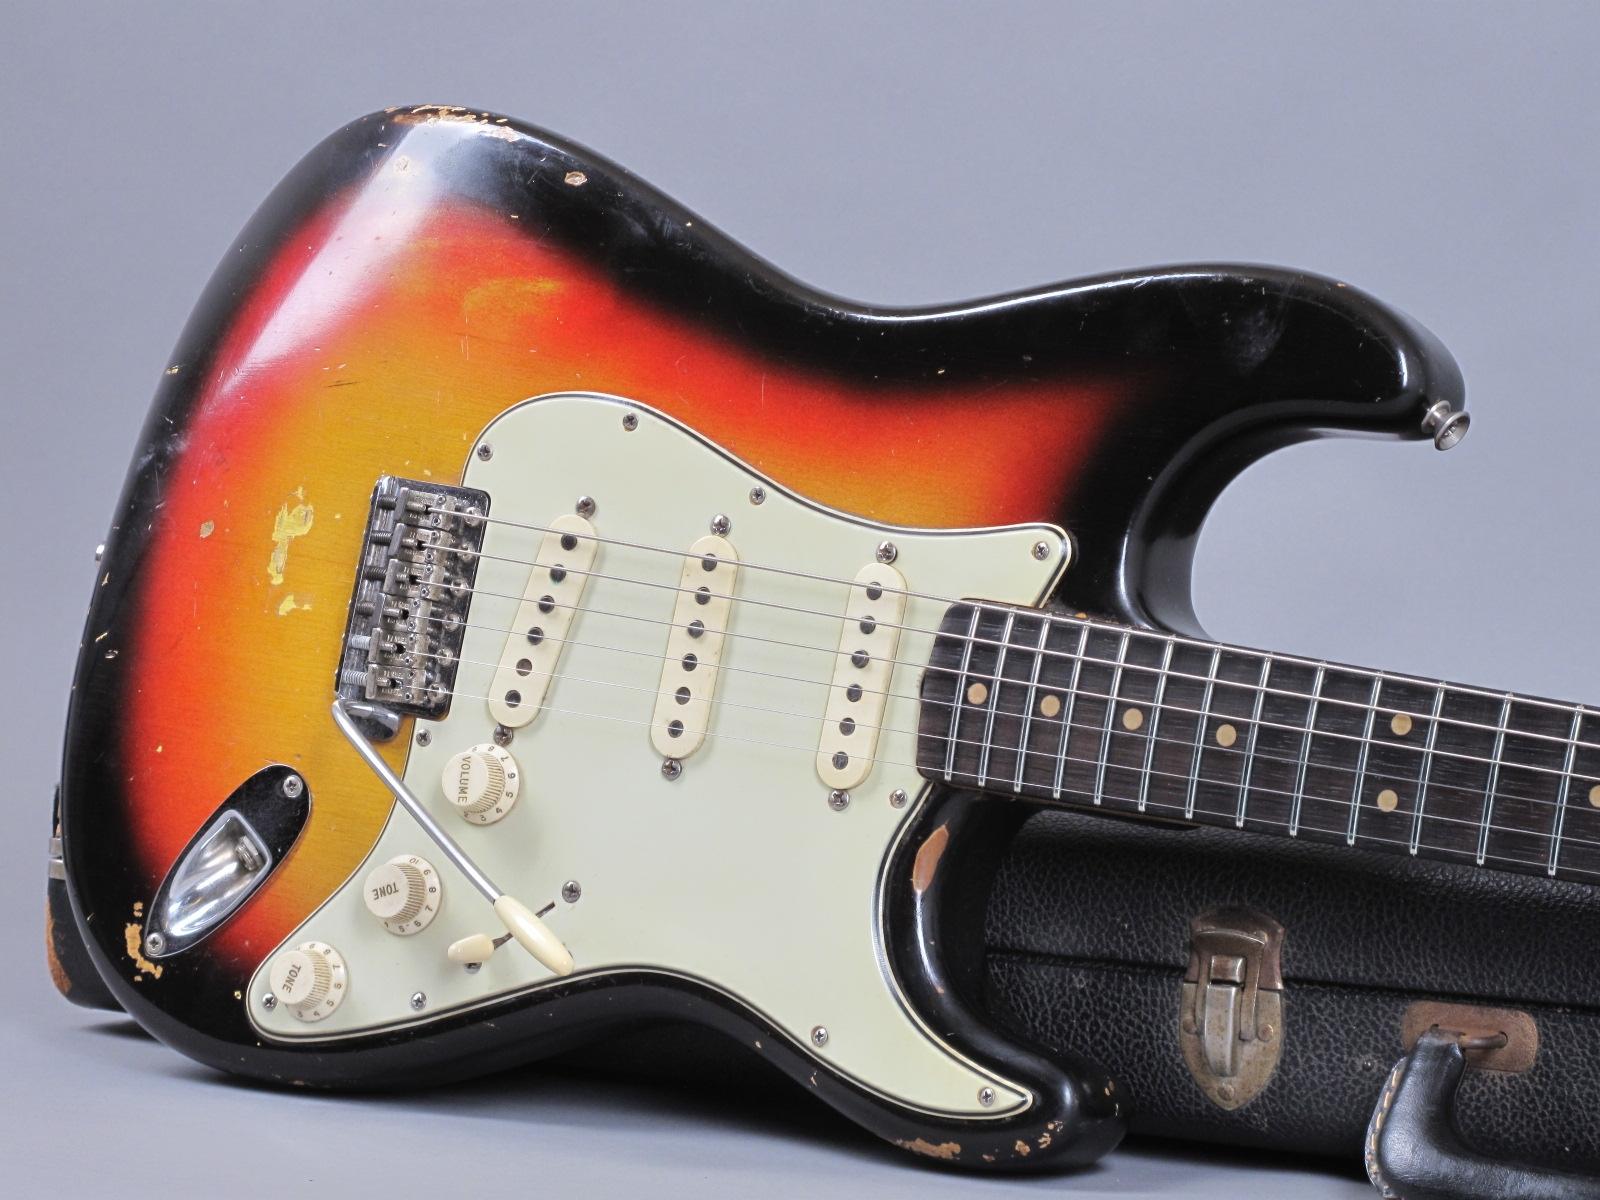 https://guitarpoint.de/app/uploads/products/1964-fender-stratocaster-3-tone-sunburst-3/1964-Fender-Stratocaster-3-tone-Sunburst-L38949_191.jpg